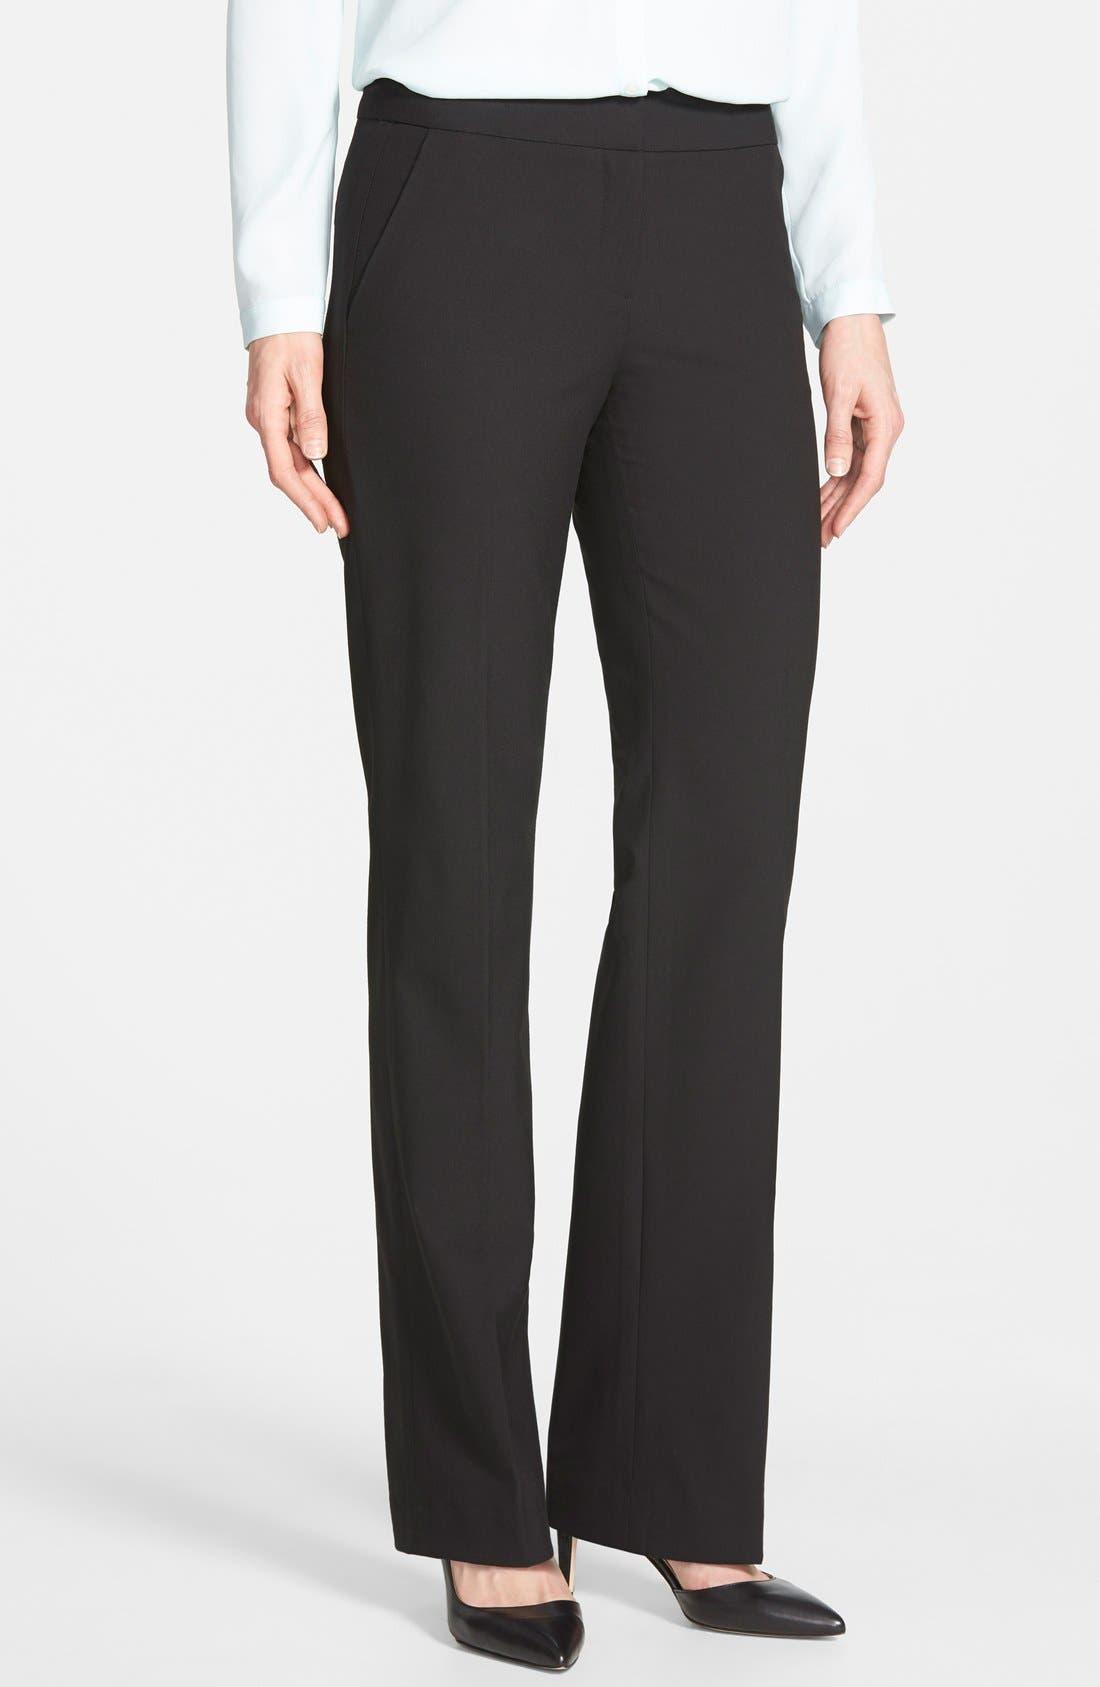 Alternate Image 1 Selected - Halogen® 'Taylor' Stretch Suit Pants (Regular & Petite)